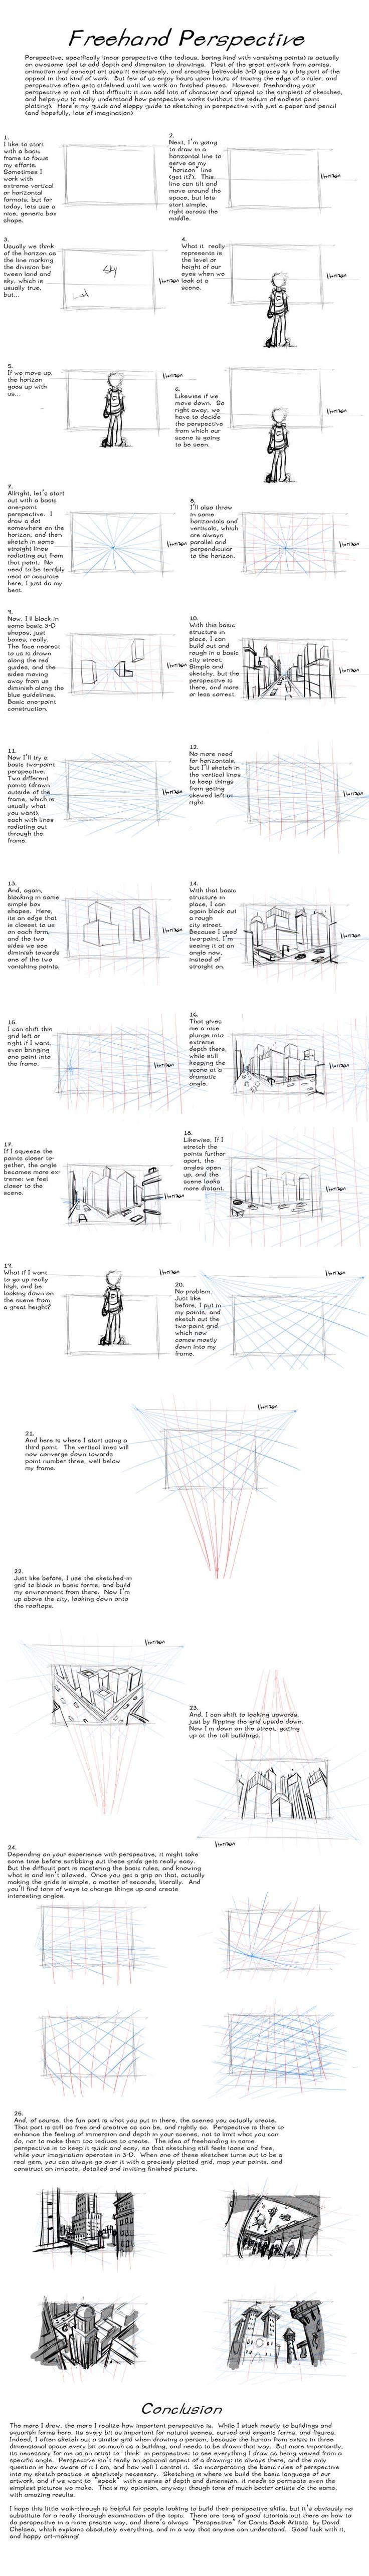 perspective ✤    CHARACTER DESIGN REFERENCES   キャラクターデザイン   çizgi film • Find more at https://www.facebook.com/CharacterDesignReferences & http://www.pinterest.com/characterdesigh if you're looking for: bandes dessinées, dessin animé #animation #banda #desenhada #toons #manga #BD #historieta #sketch #how #to #draw #strip #fumetto #settei #fumetti #manhwa #anime #cartoni #animati #comics #cartoon    ✤